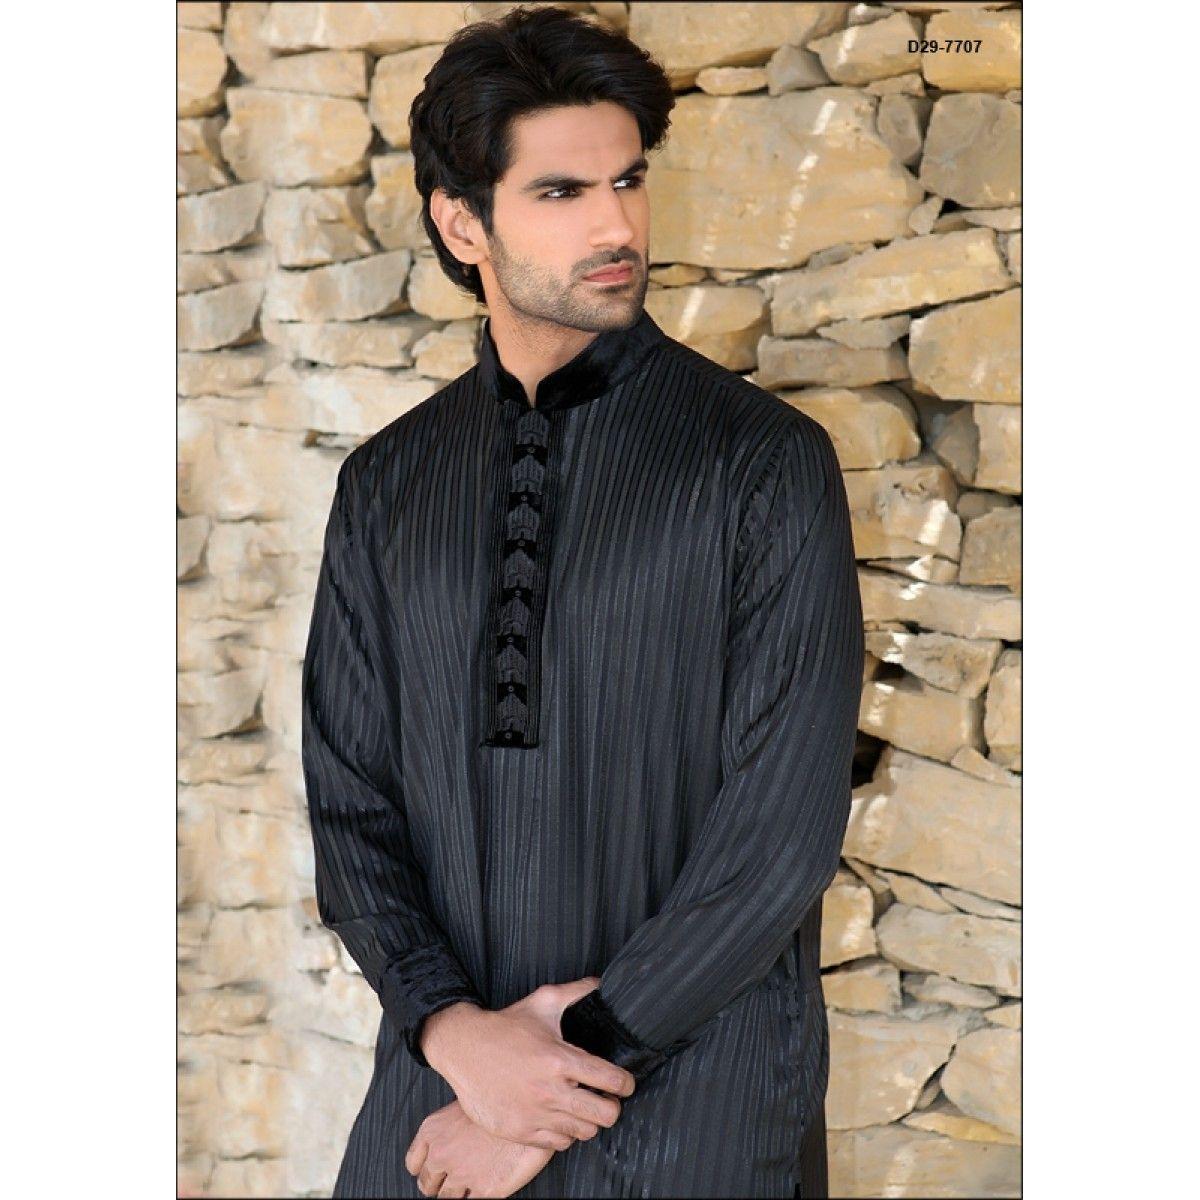 Eid kids kurta shalwar kameez designs 2013 2014 - Kurta Shalwar For Men And Men S Designer Salwar Kameez Suits Online Best Pakistani Salvar Kamiz Design Indian Kurtas Shalwaar Outfits For Boys Kids